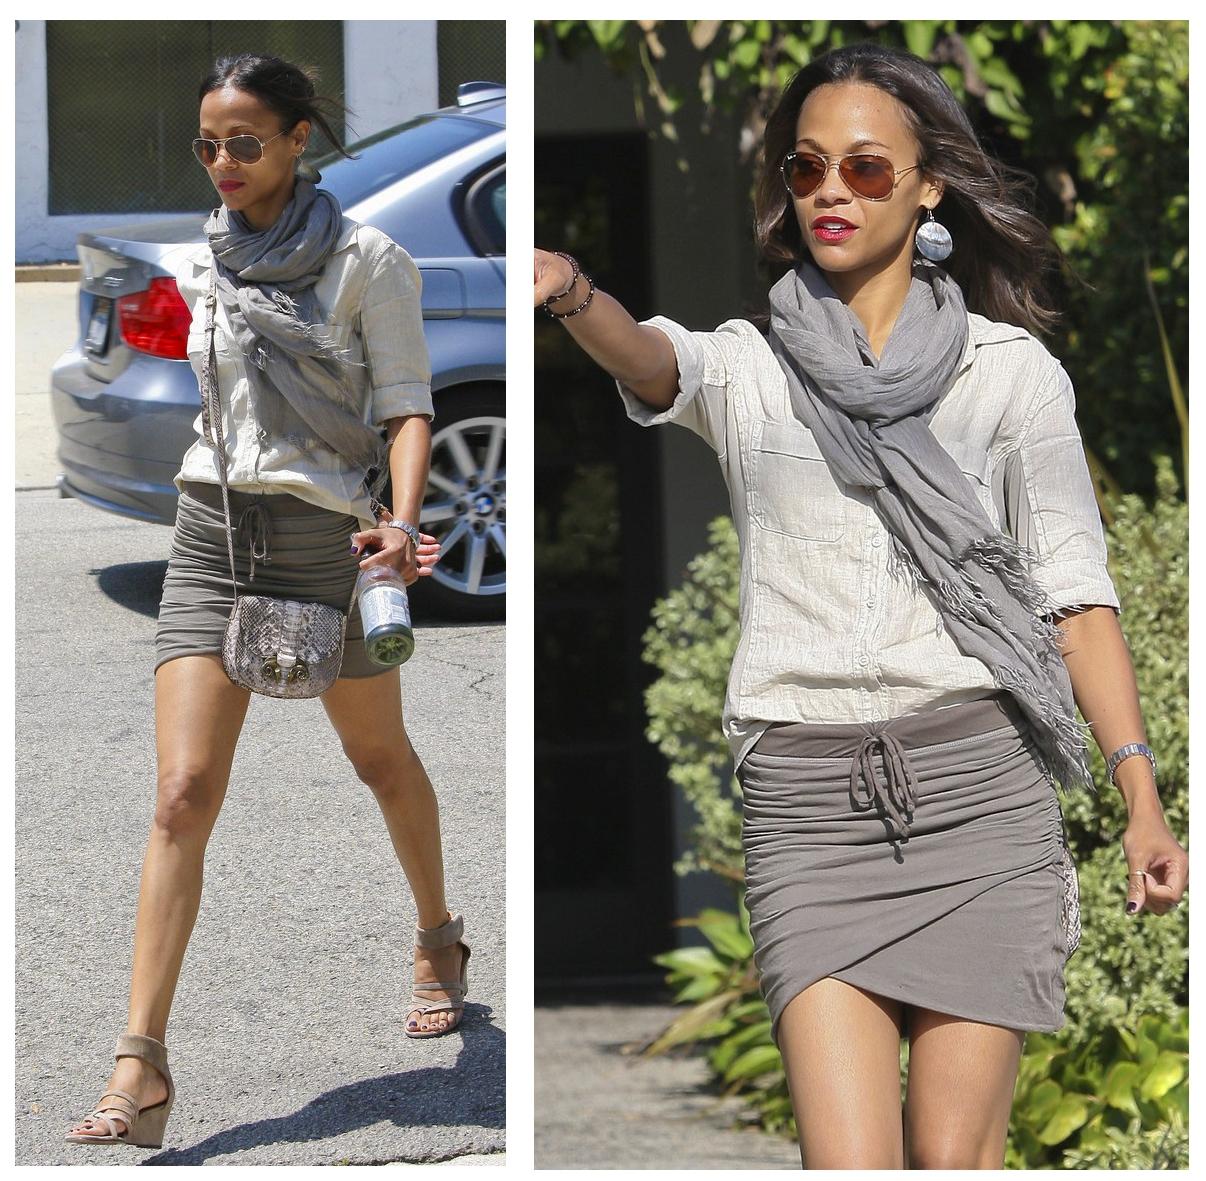 Zoe Saldana Style, Fashion Looks - StyleBistro 82